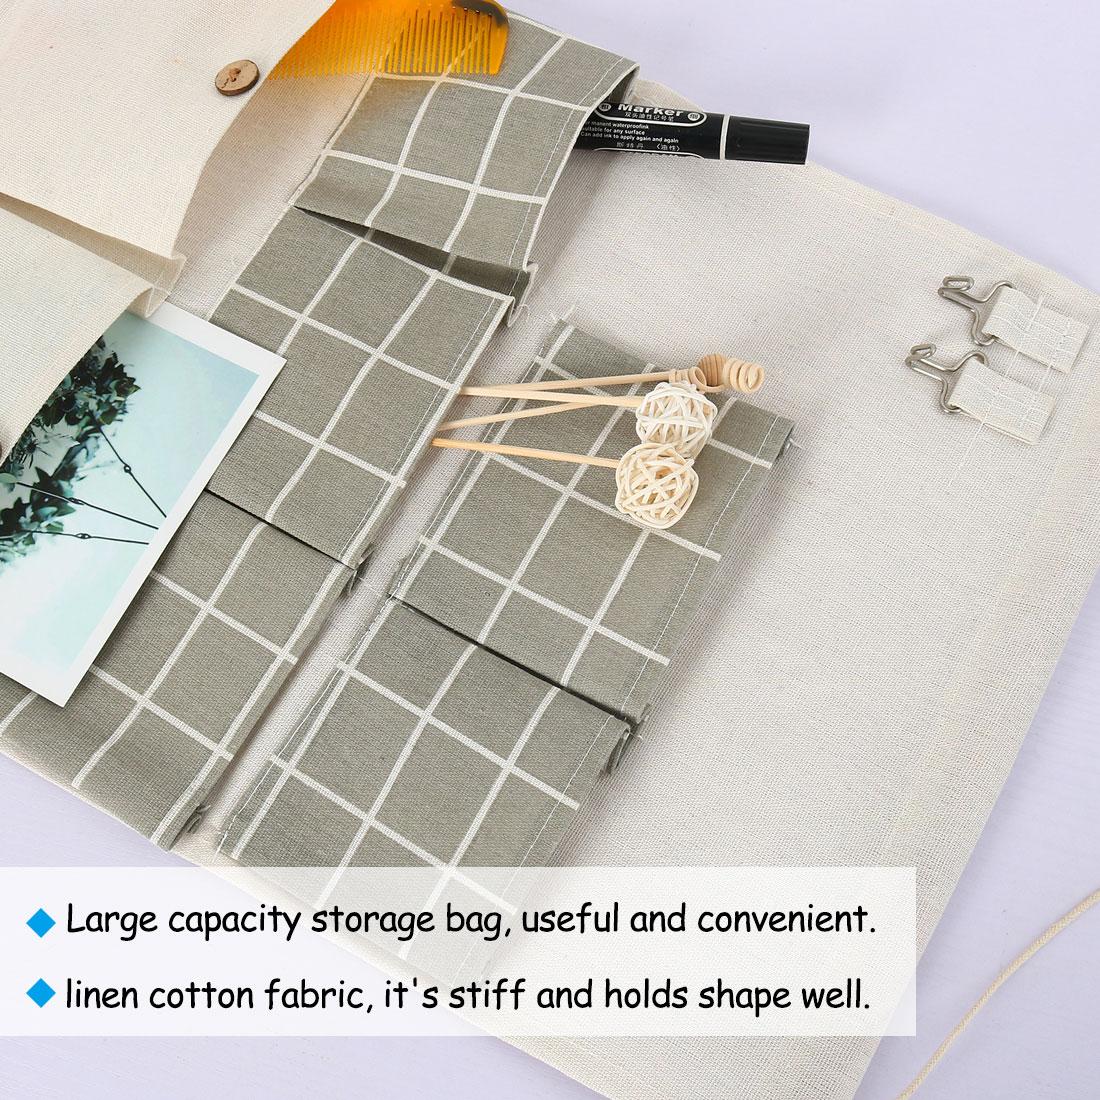 "Closet Foldable Hanging Storage Bag 19.5"" x 13.6"" Organizer Gray Square Pattern - image 3 de 7"